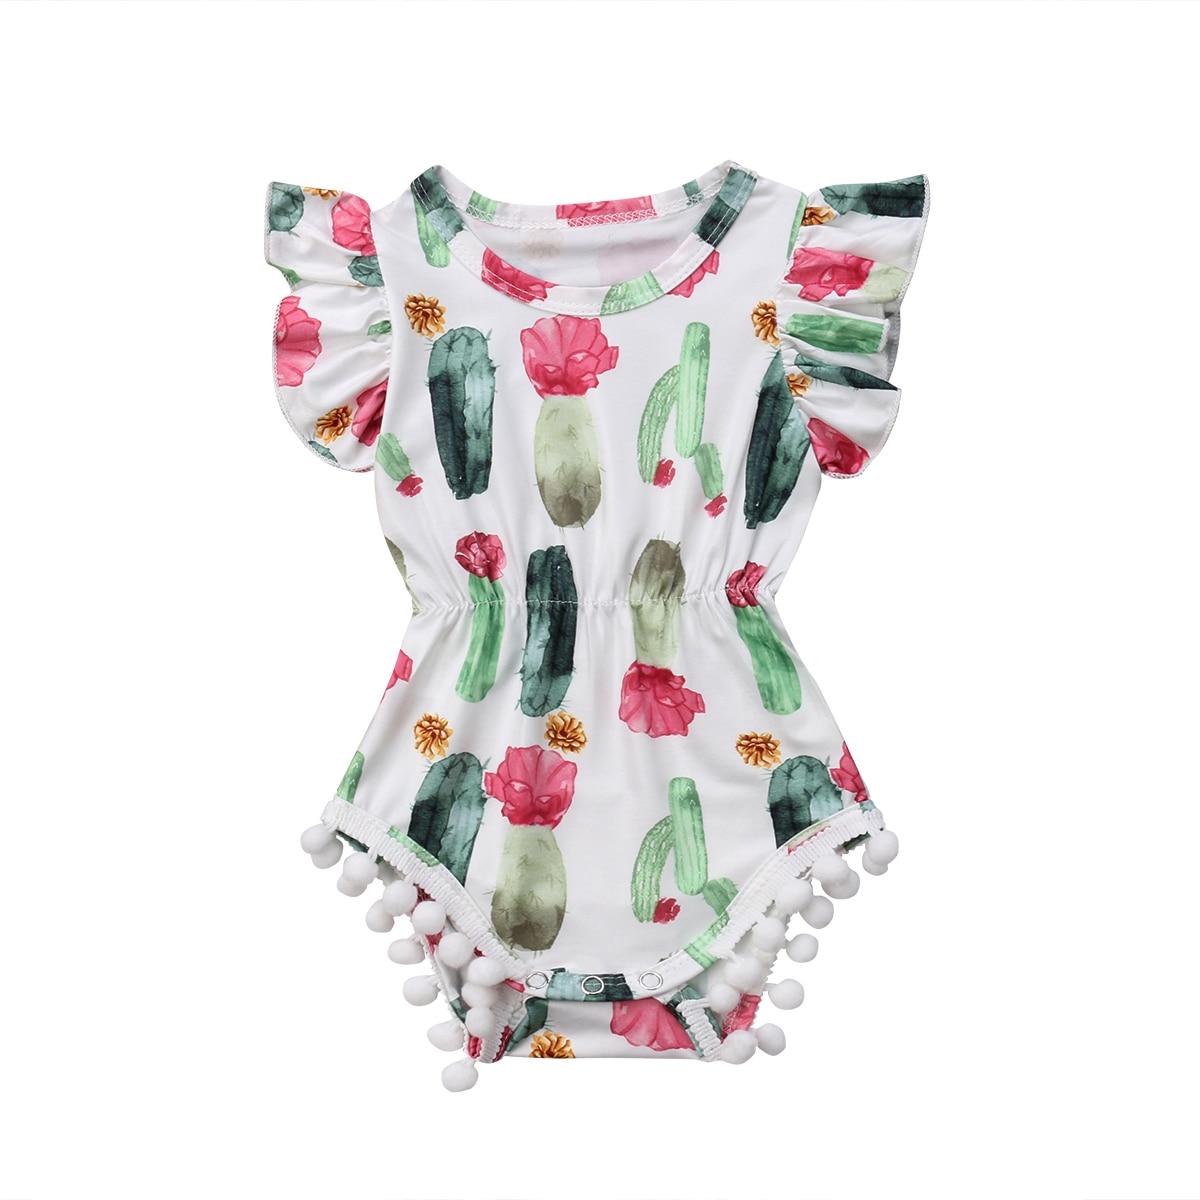 Cute Newborn Baby Girl Ruffle Cactus Print Romper Sleeveless Tassel Jumpsuit Clothes Outfit Summer